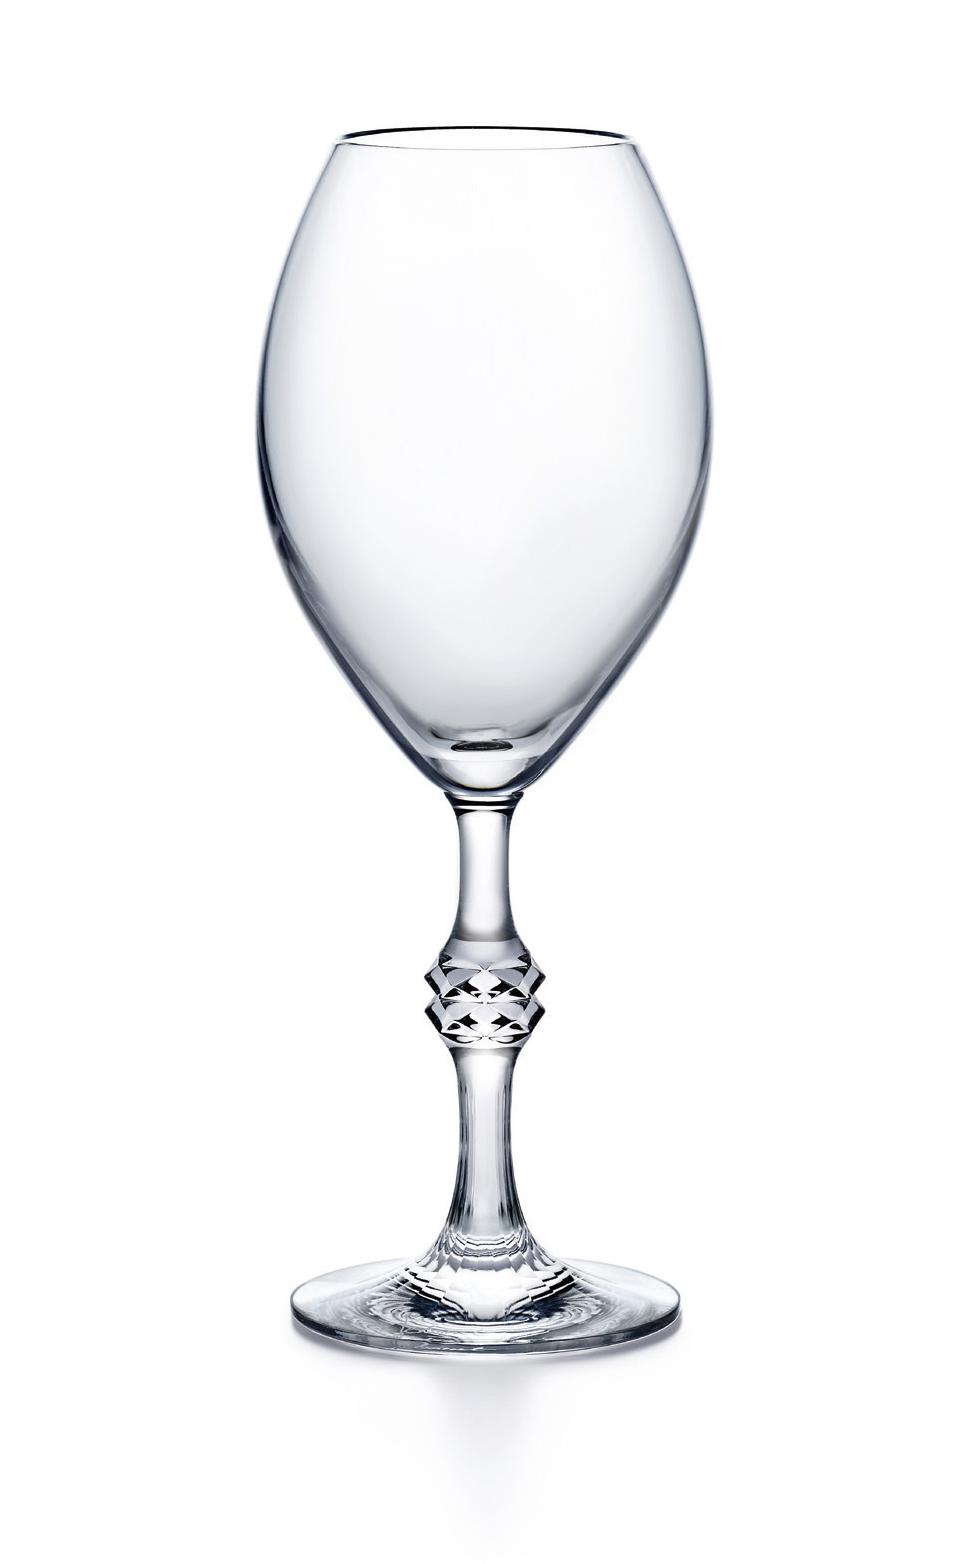 verre-Baccarat-design-produit-eric-berthes.jpg